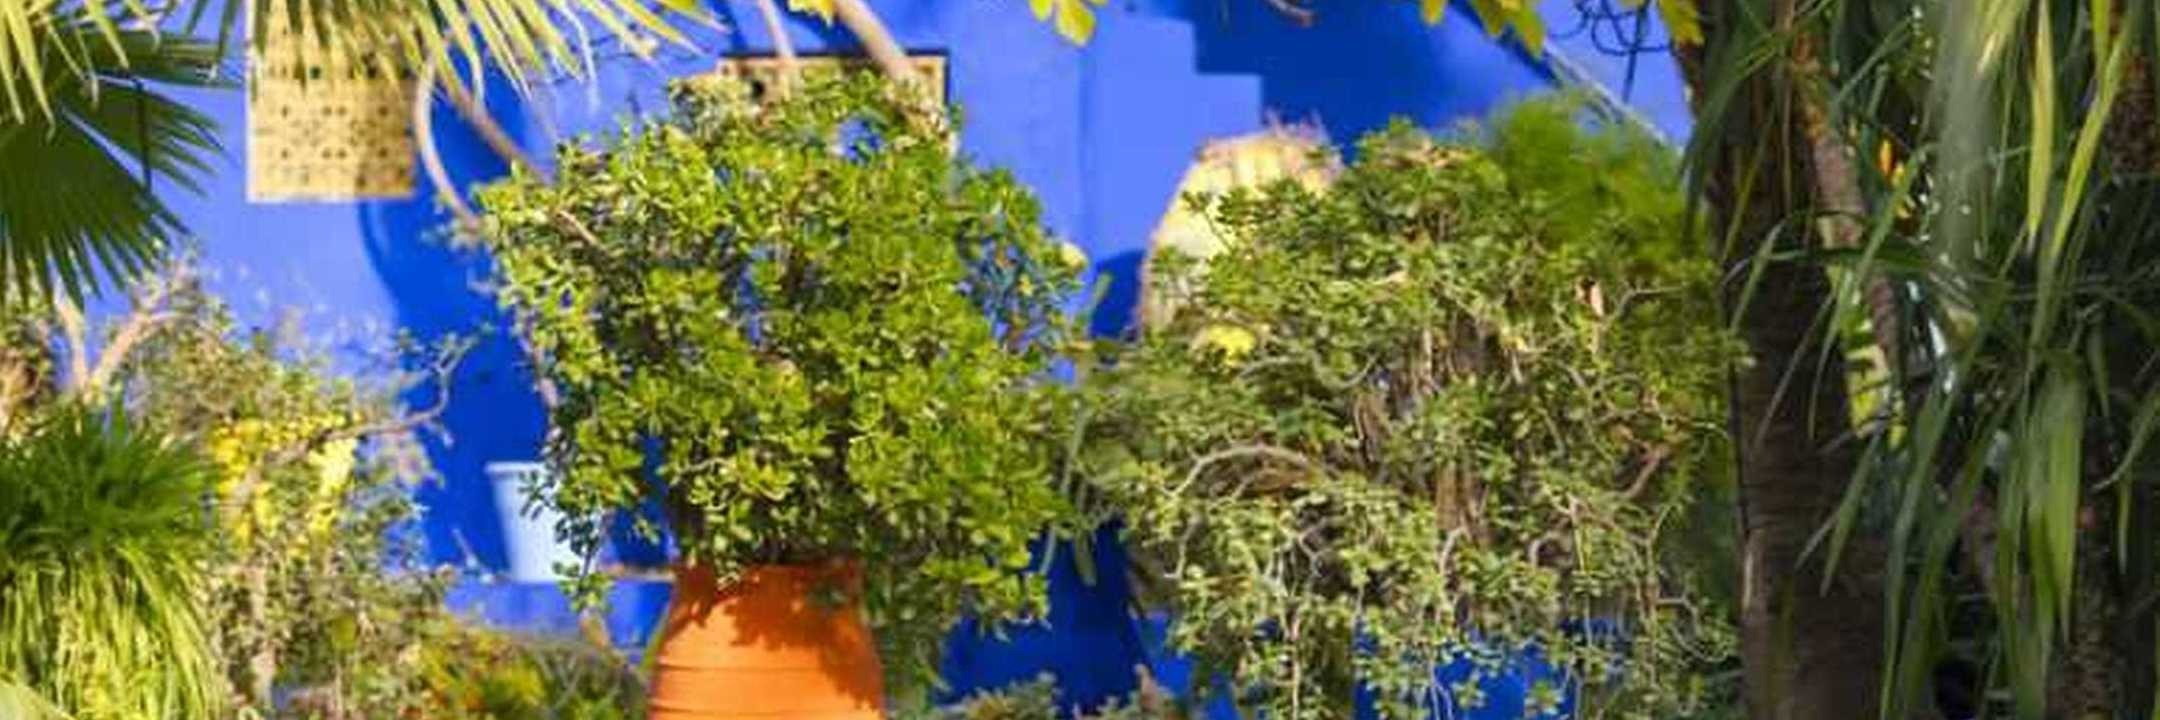 Conheça a casa-museu de Yves Saint Laurent